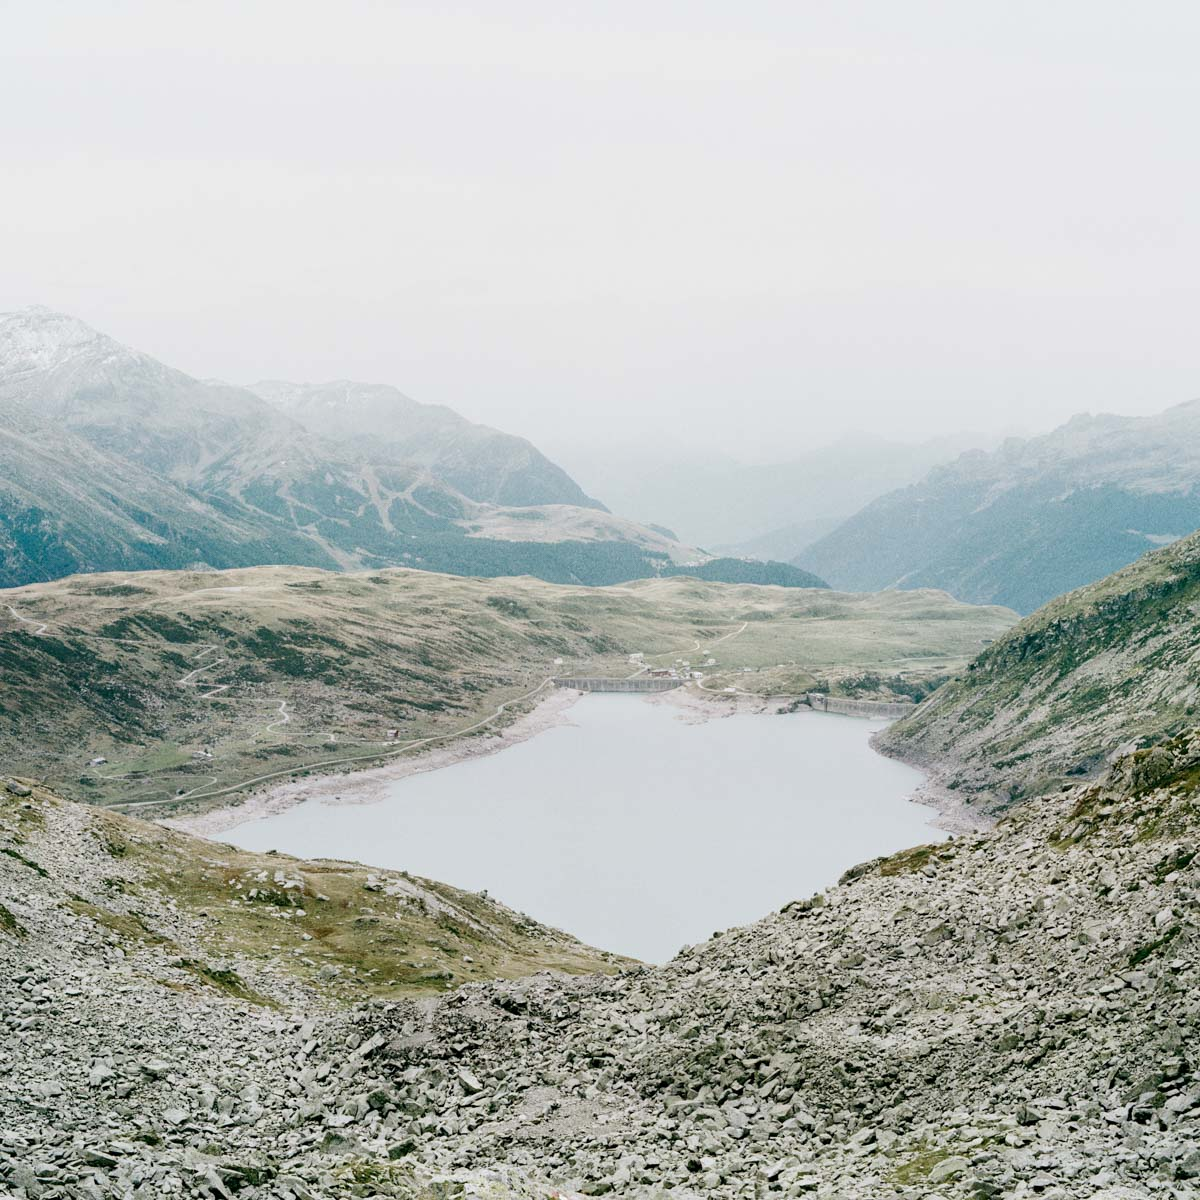 splügen pass bergsee see Steine geröll berge nebel wandern gipfel horizont landschaft italien jörn strojny